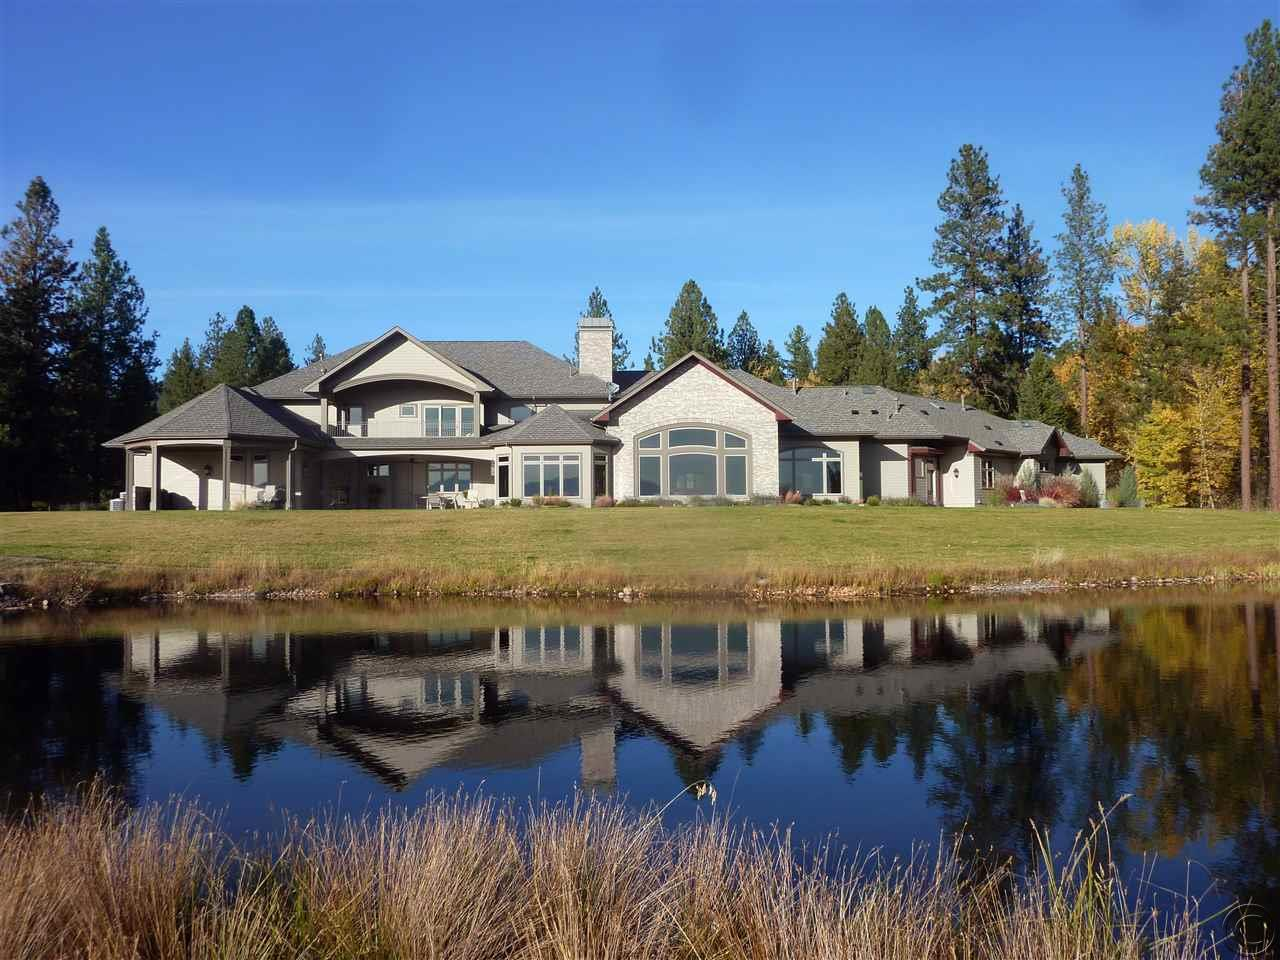 Real Estate for Sale, ListingId: 36141239, Missoula,MT59808